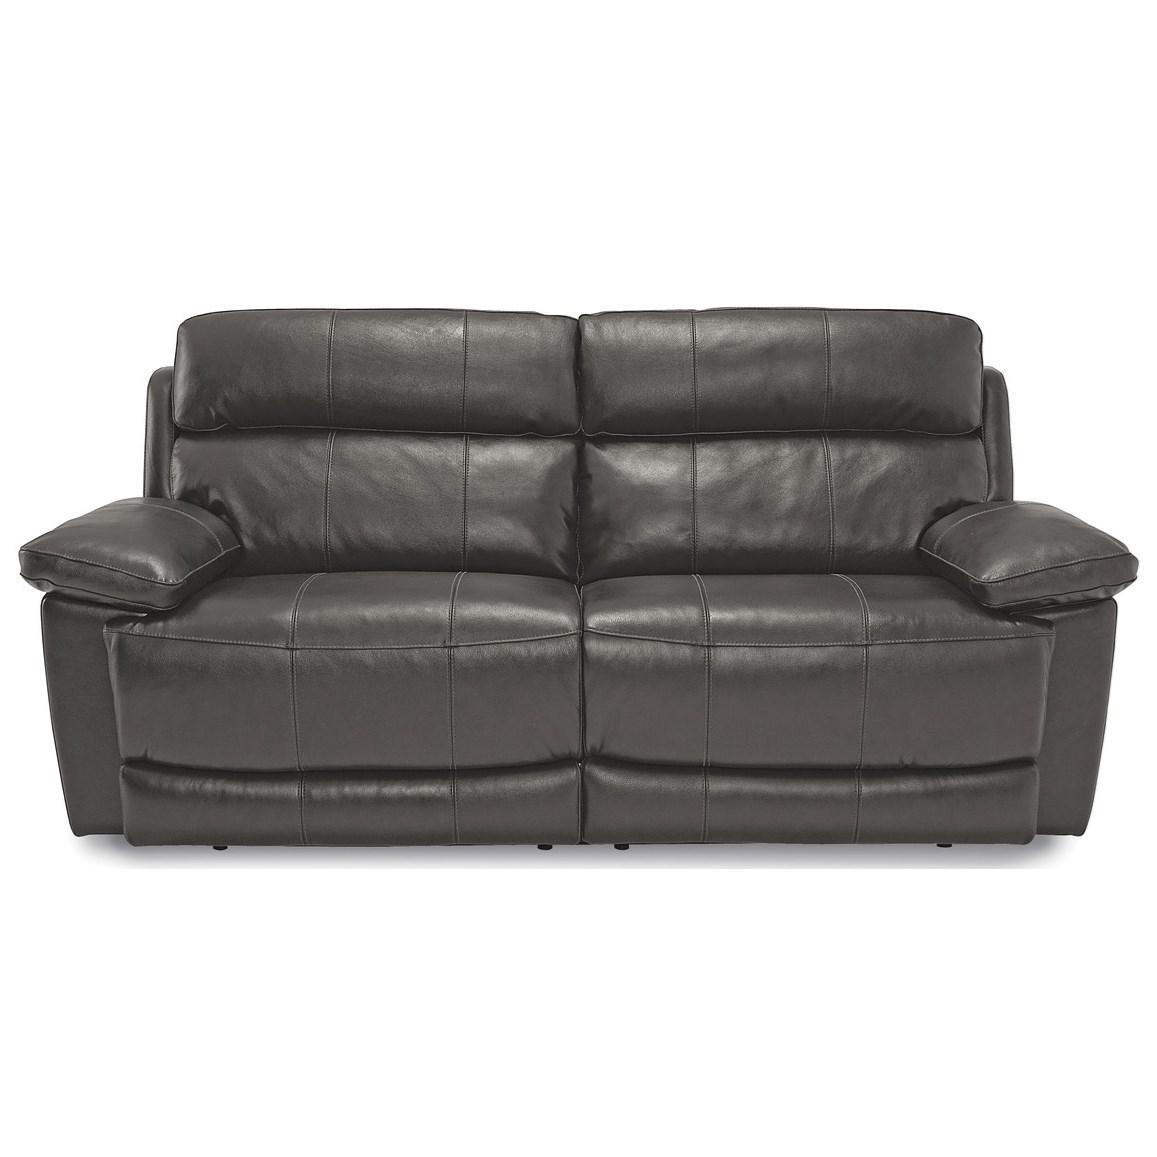 Finley Power Headrest Reclining Sofa by Palliser at Upper Room Home Furnishings